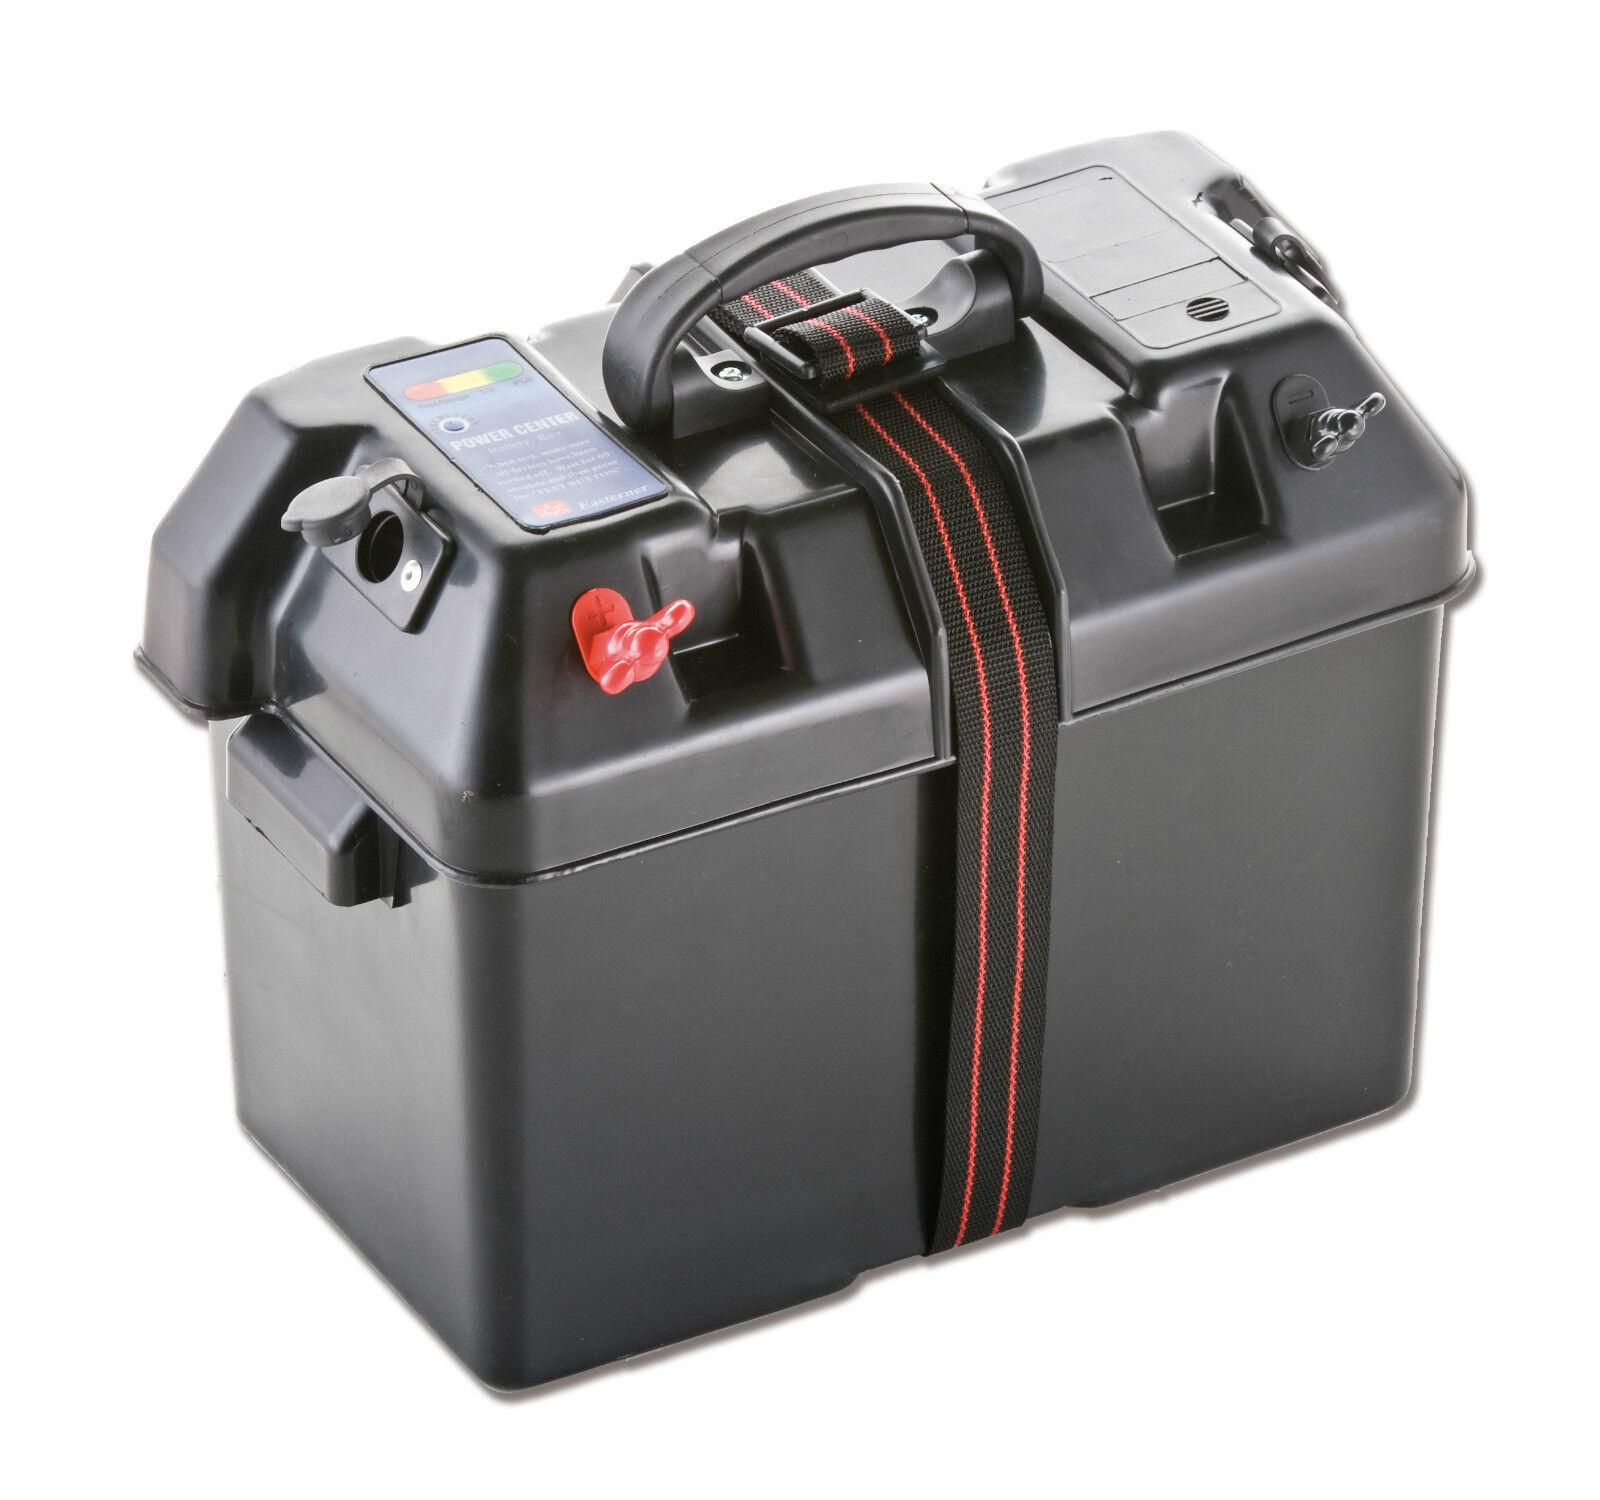 Batteriekasten Jolly Pole außenliegende 2 Zigarettenanzünder Pole Jolly Maße: 325x180x23 c7a47e